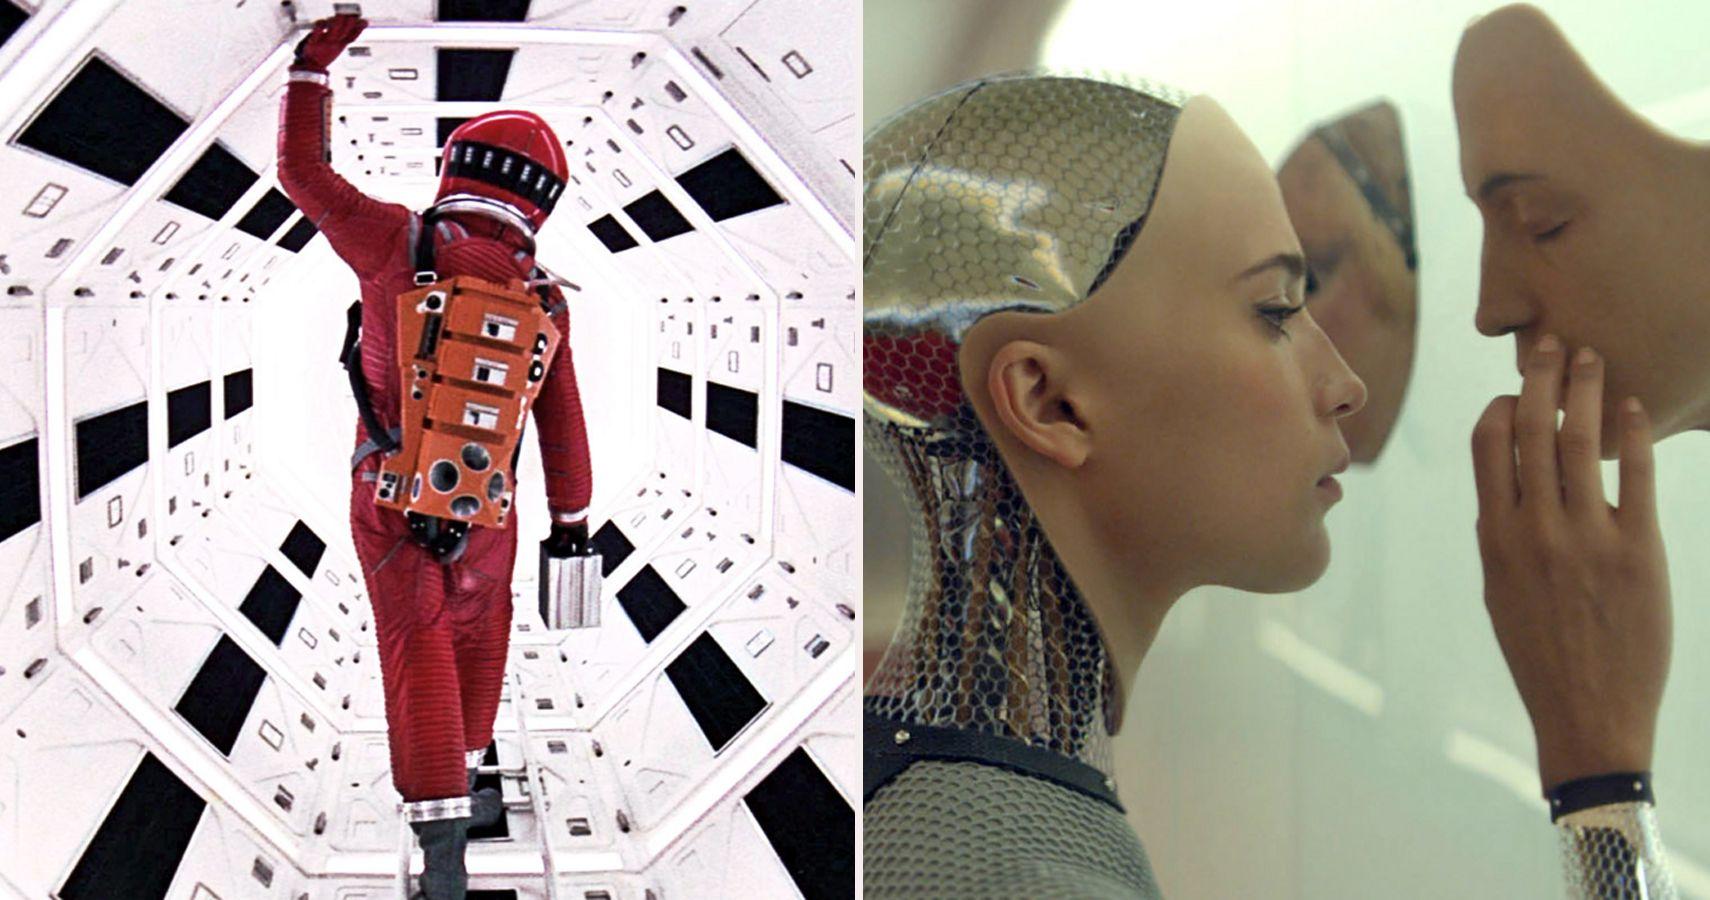 10 Sci-Fi Movies To Watch If You Like Annihilation | ScreenRant